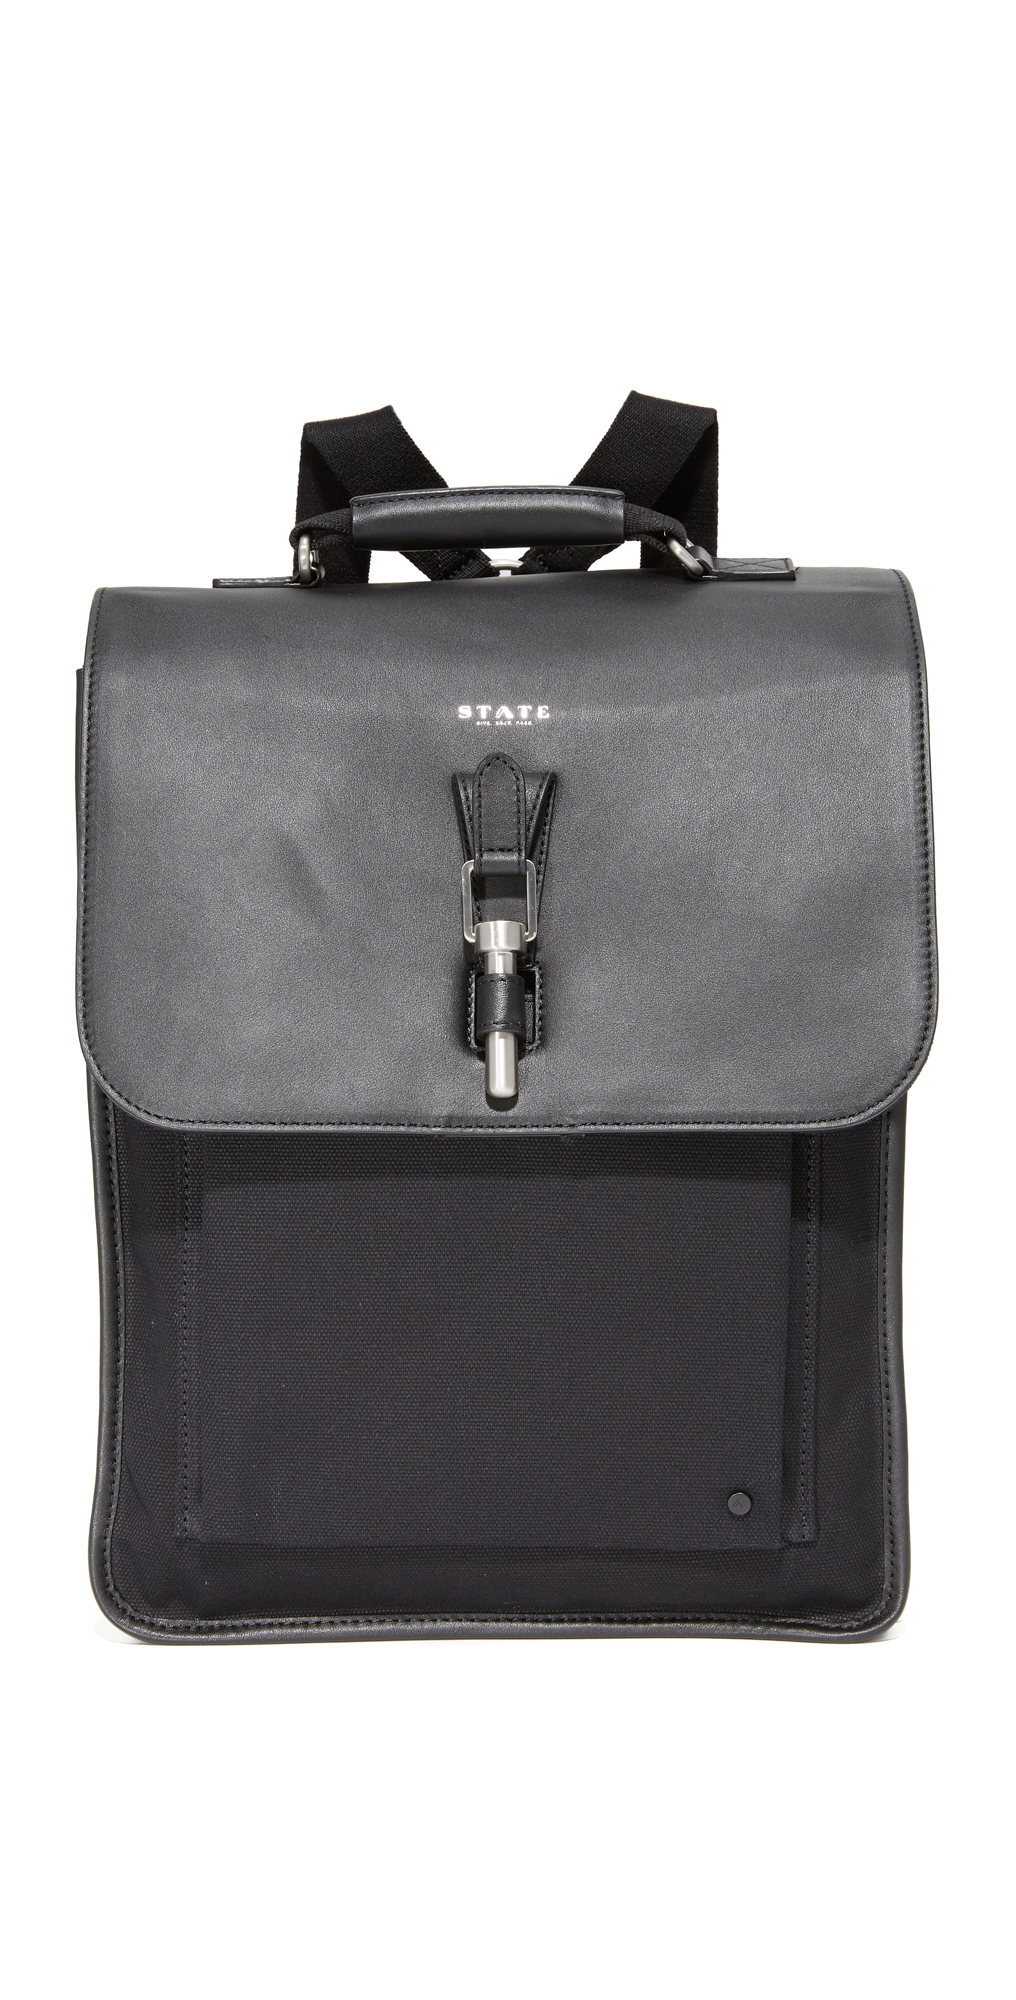 Wythe Backpack STATE